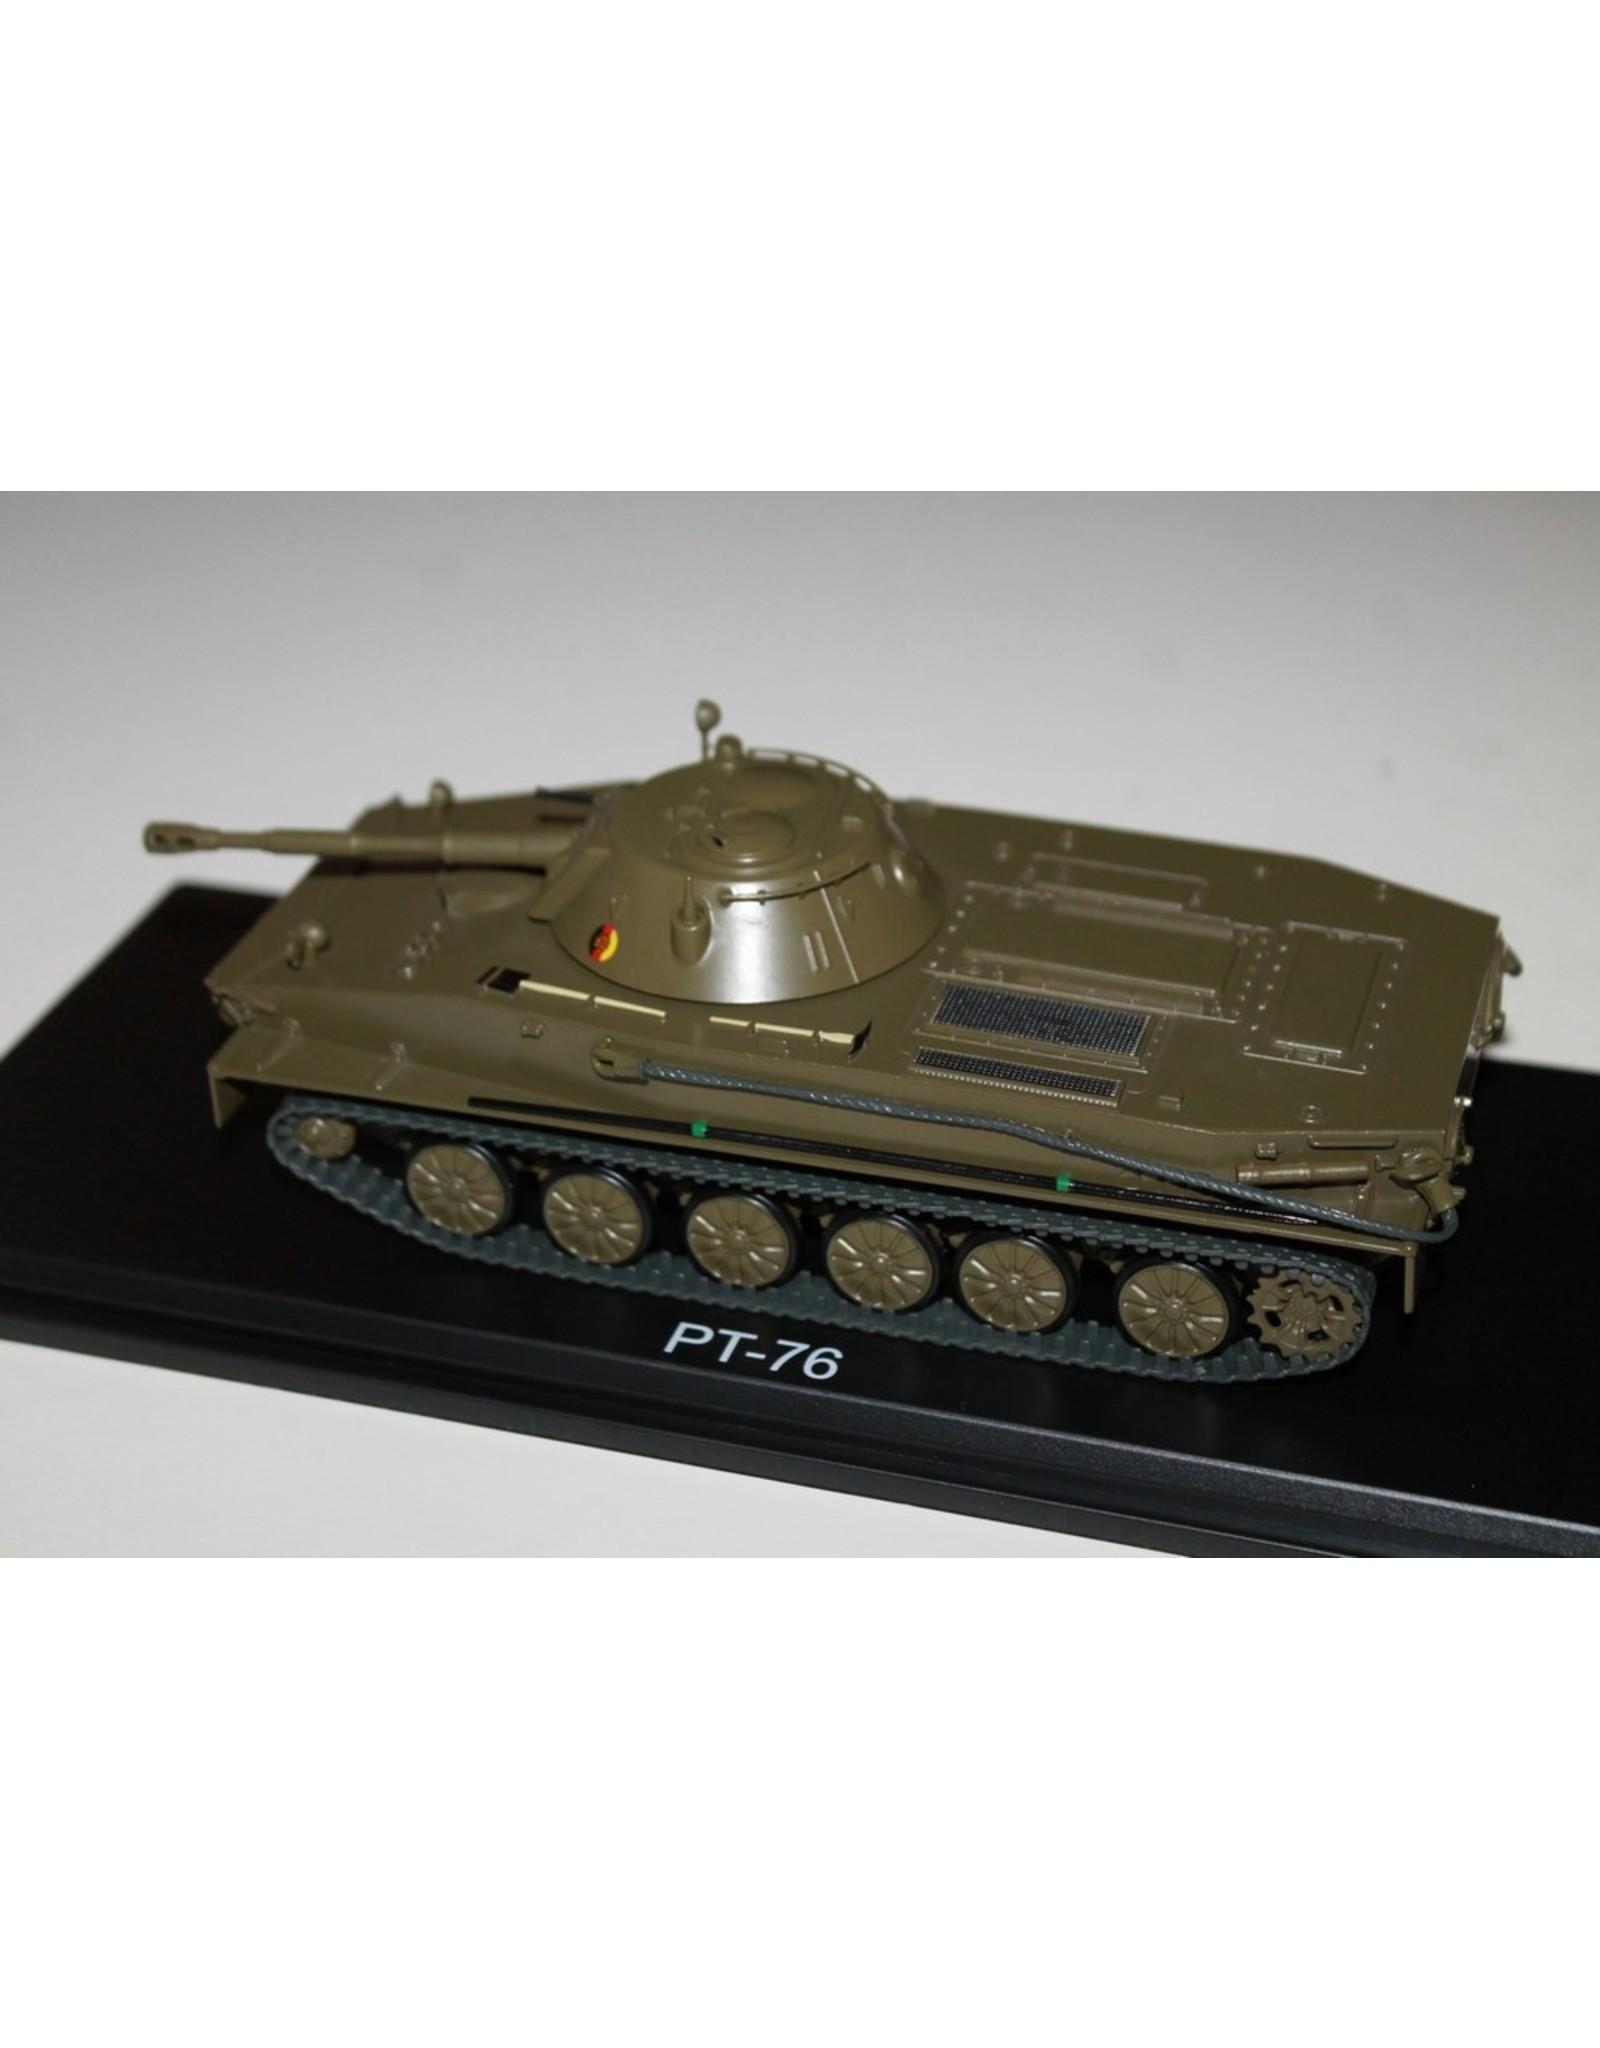 Panzer Panzer PT-76 NVA - 1:43 - Premium ClassiXXs